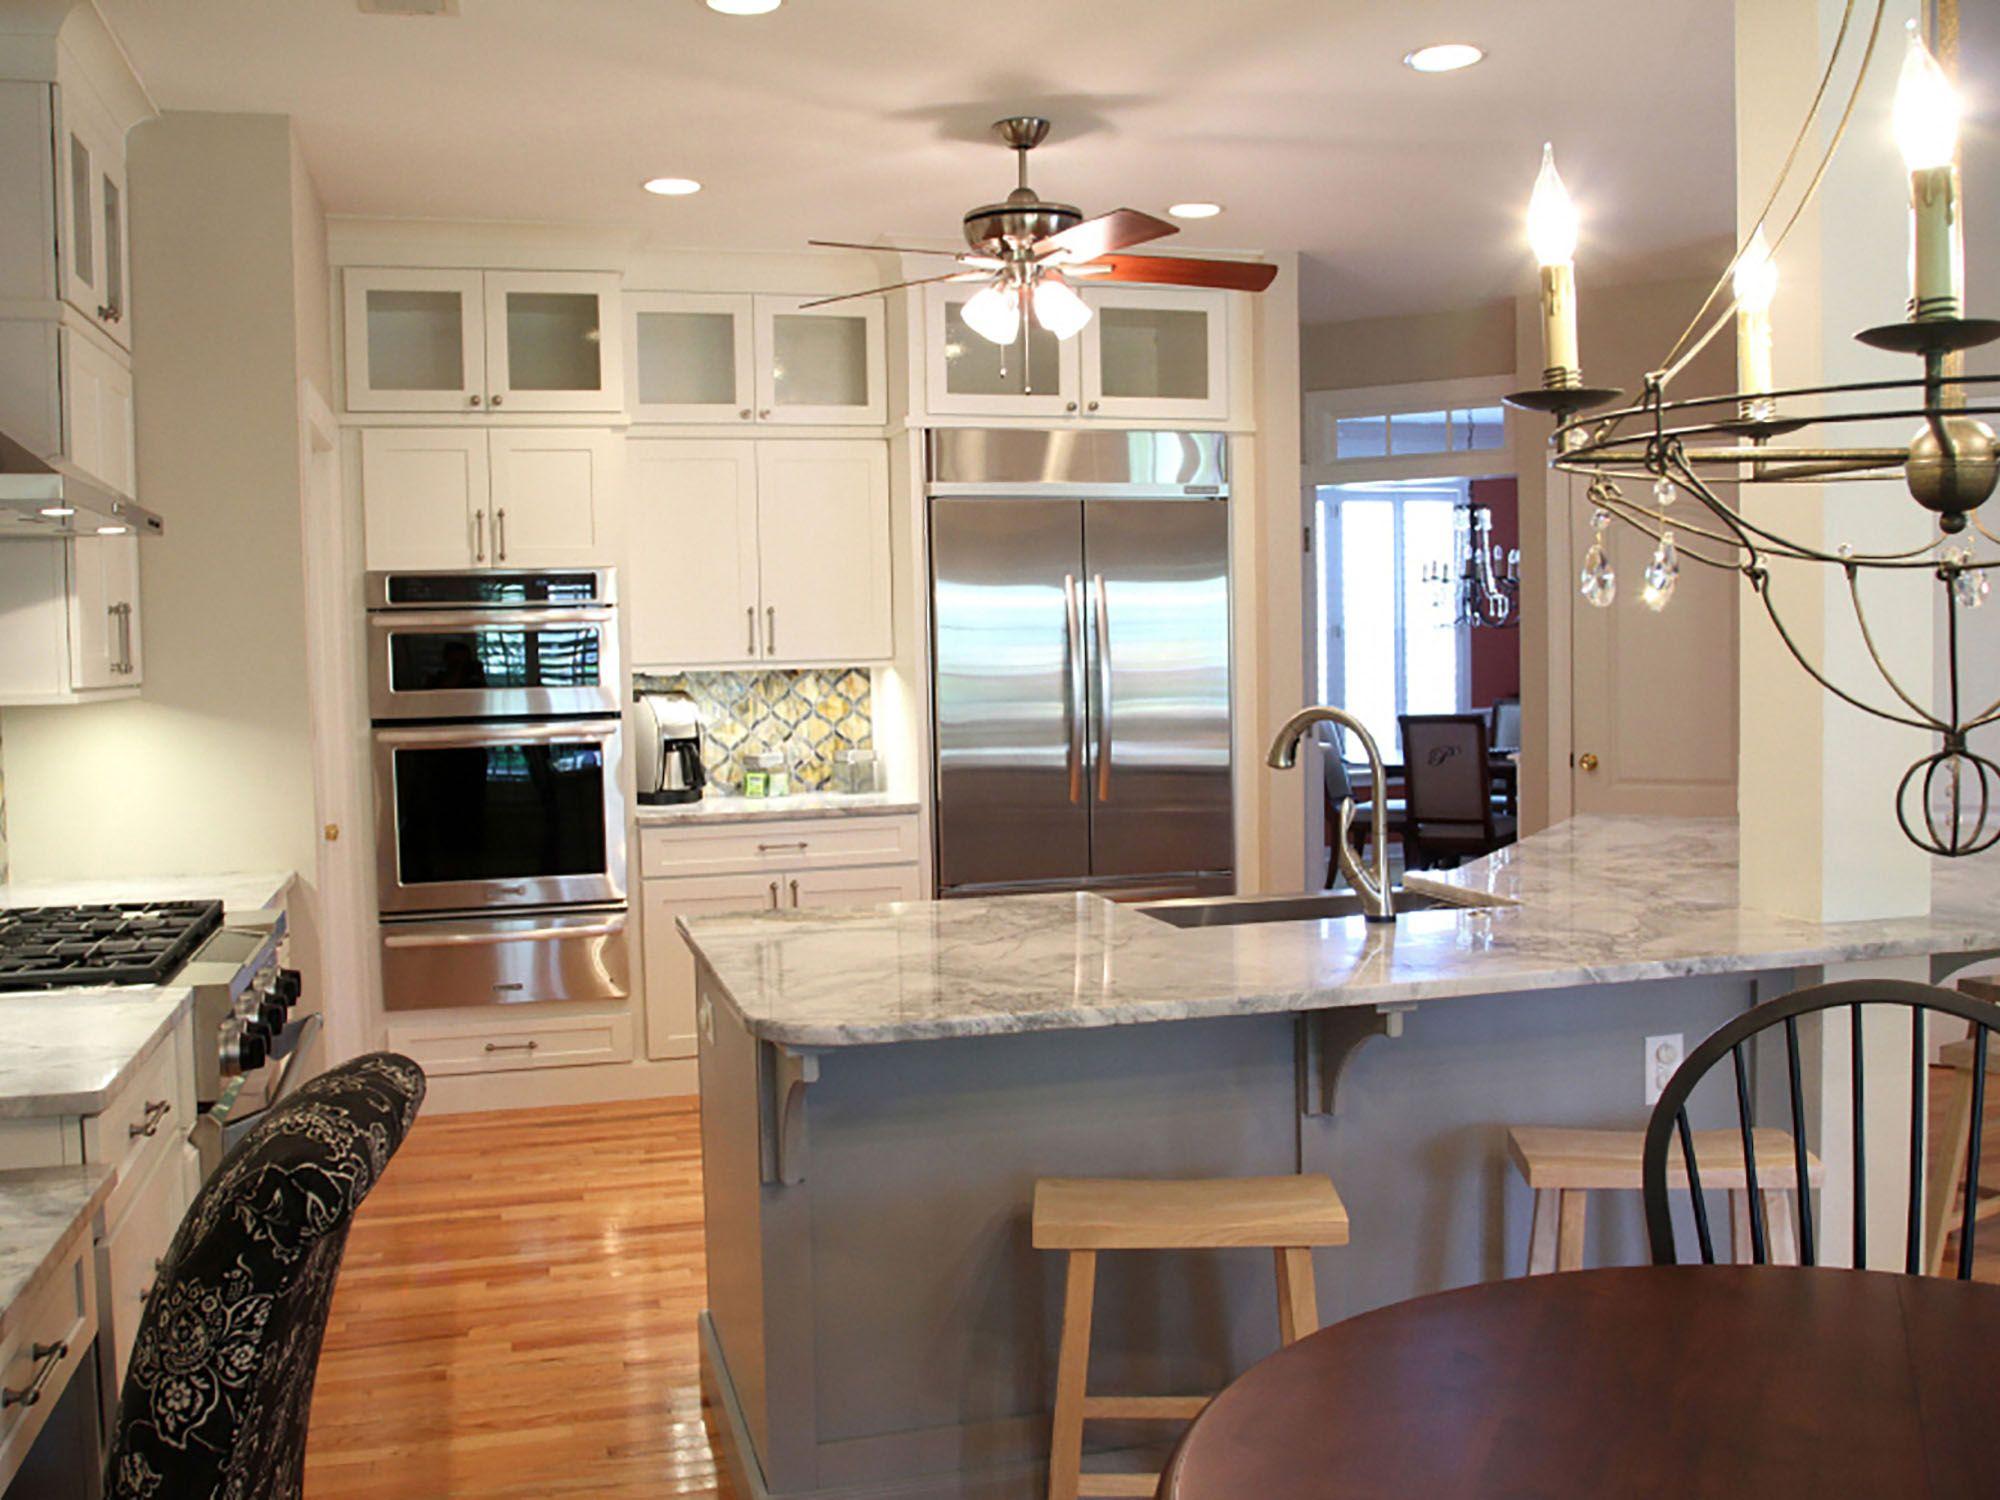 Mount Pleasant South Carolina kitchen renovation features ...